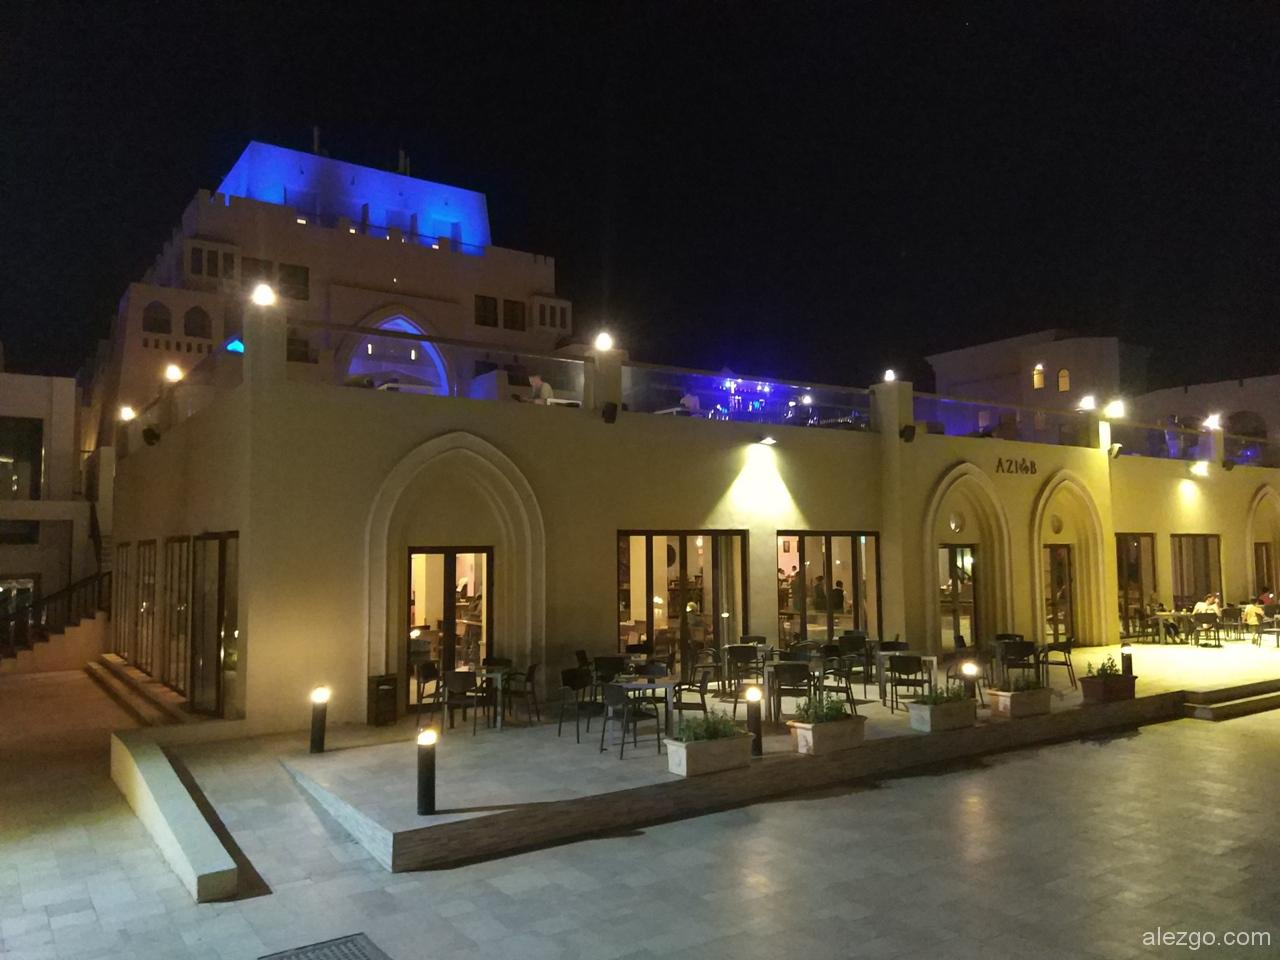 акаба, тала бей, Grand Swiss-Belresort Tala Bay 5*, иордания, гранд свисс белресорт